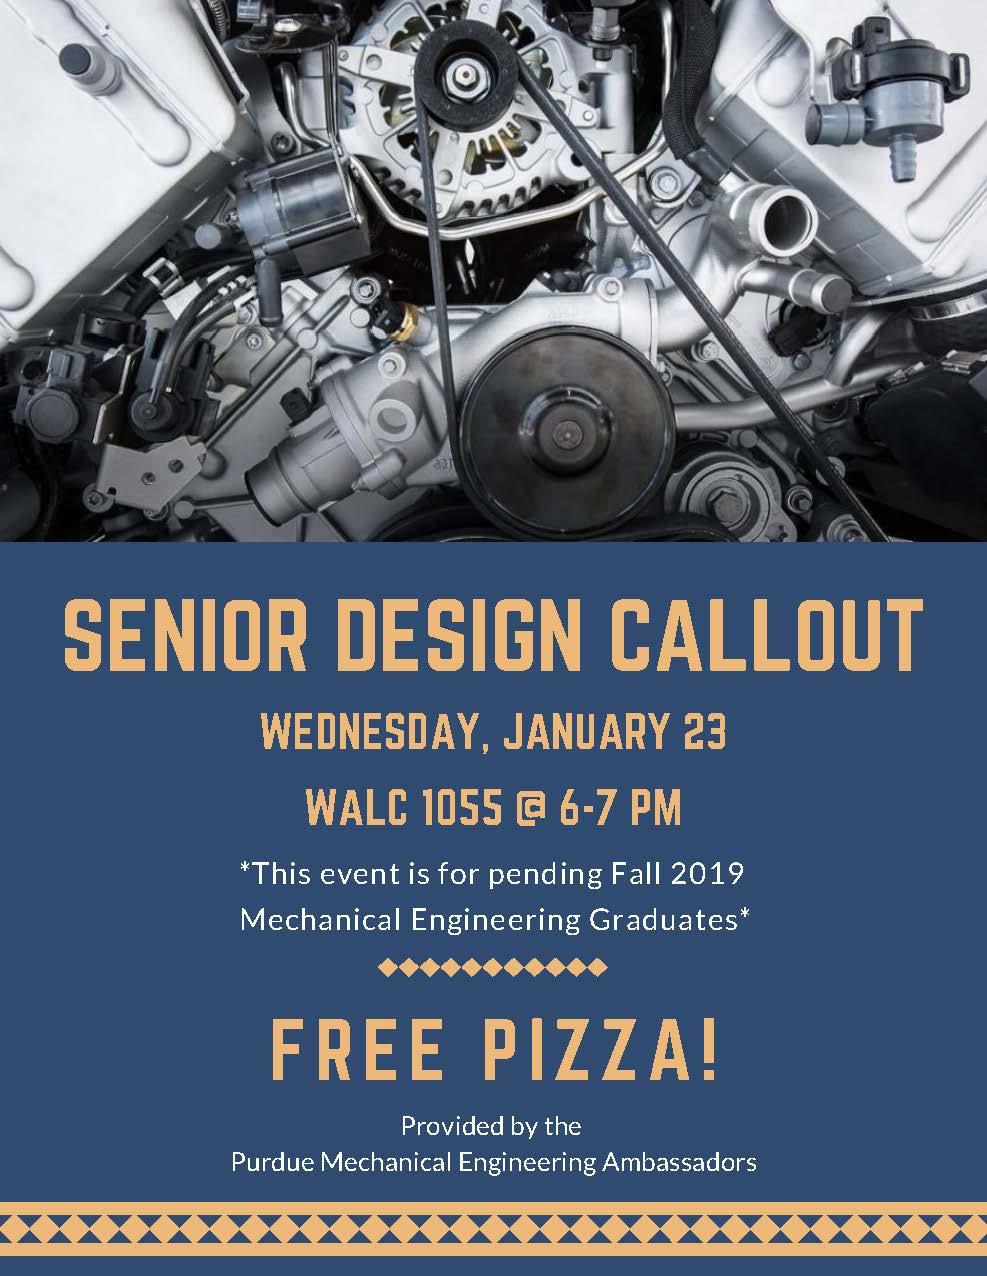 Senior Design Fall 2019